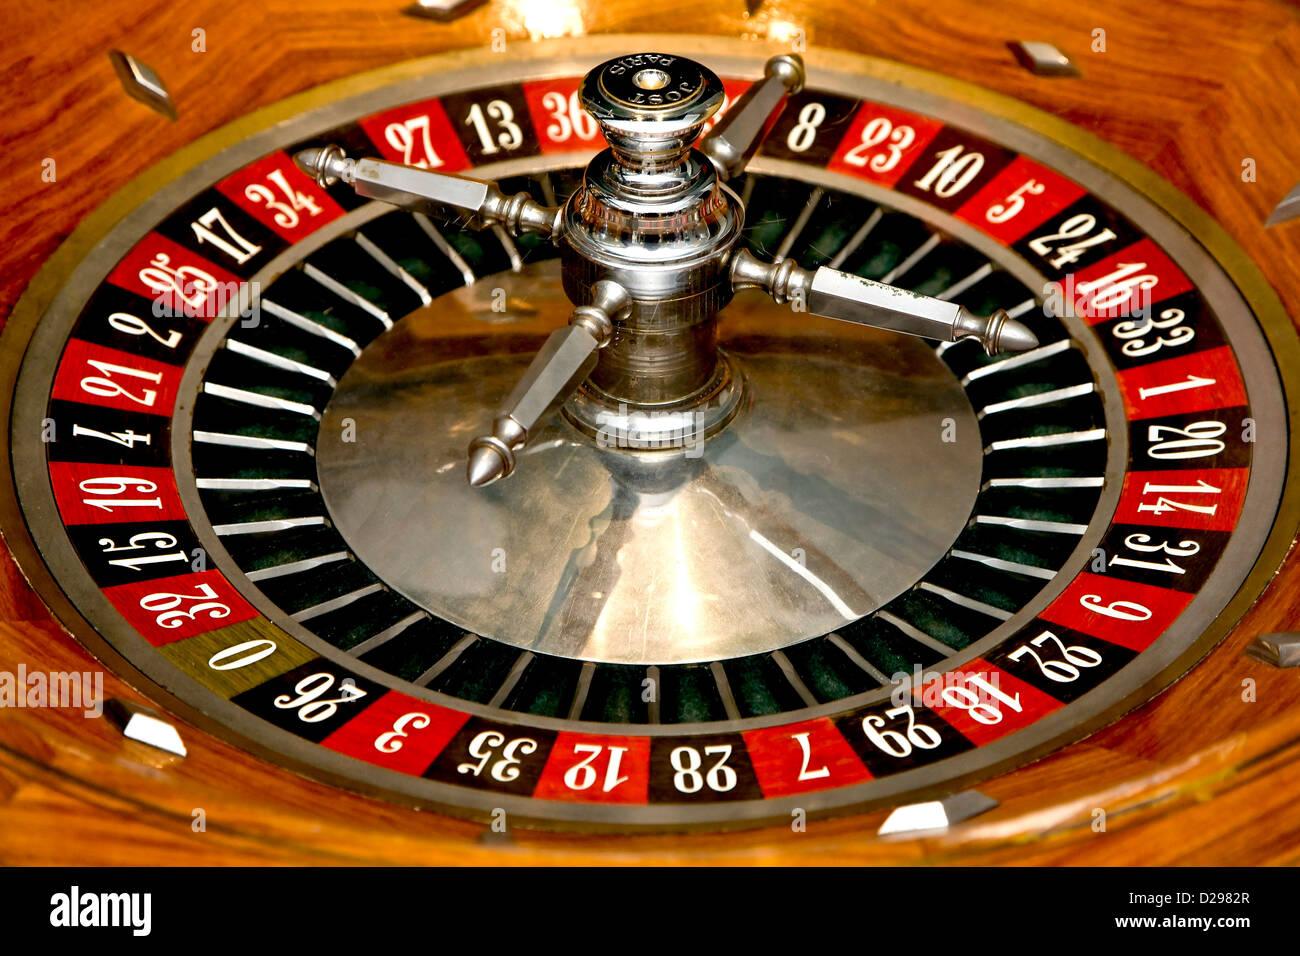 Live Roulette Wheel